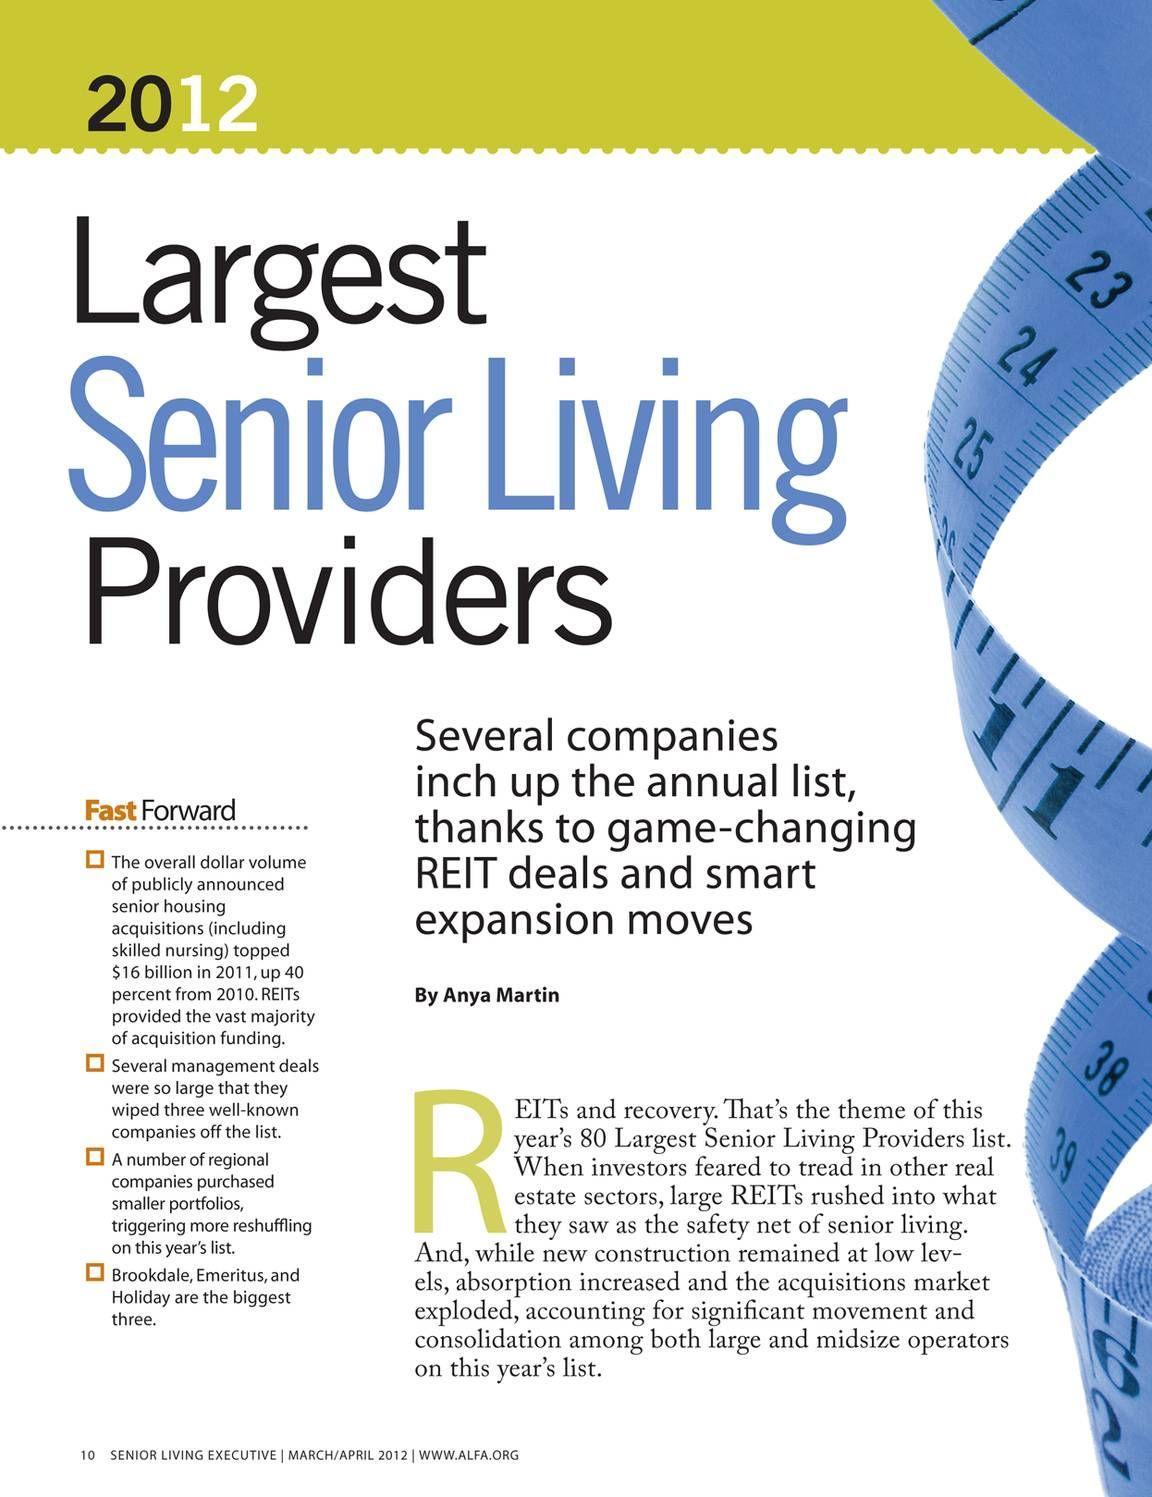 ALFA 2012 Largest Senior Living Providers List (With